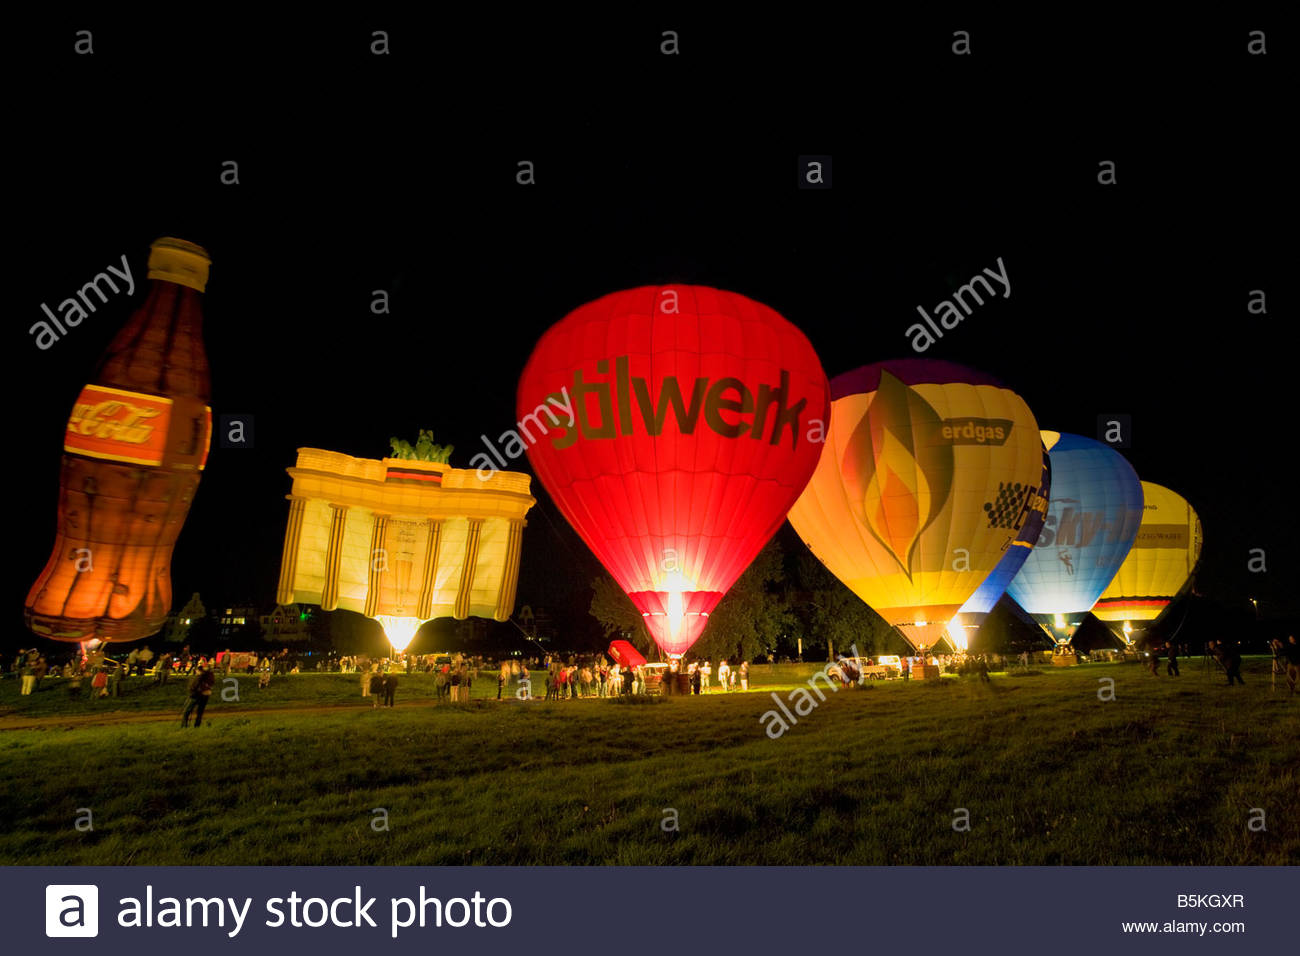 Ballonnen Met Licht : Heißluft ballon nightglow dunkelheit nacht beleuchtung glühende